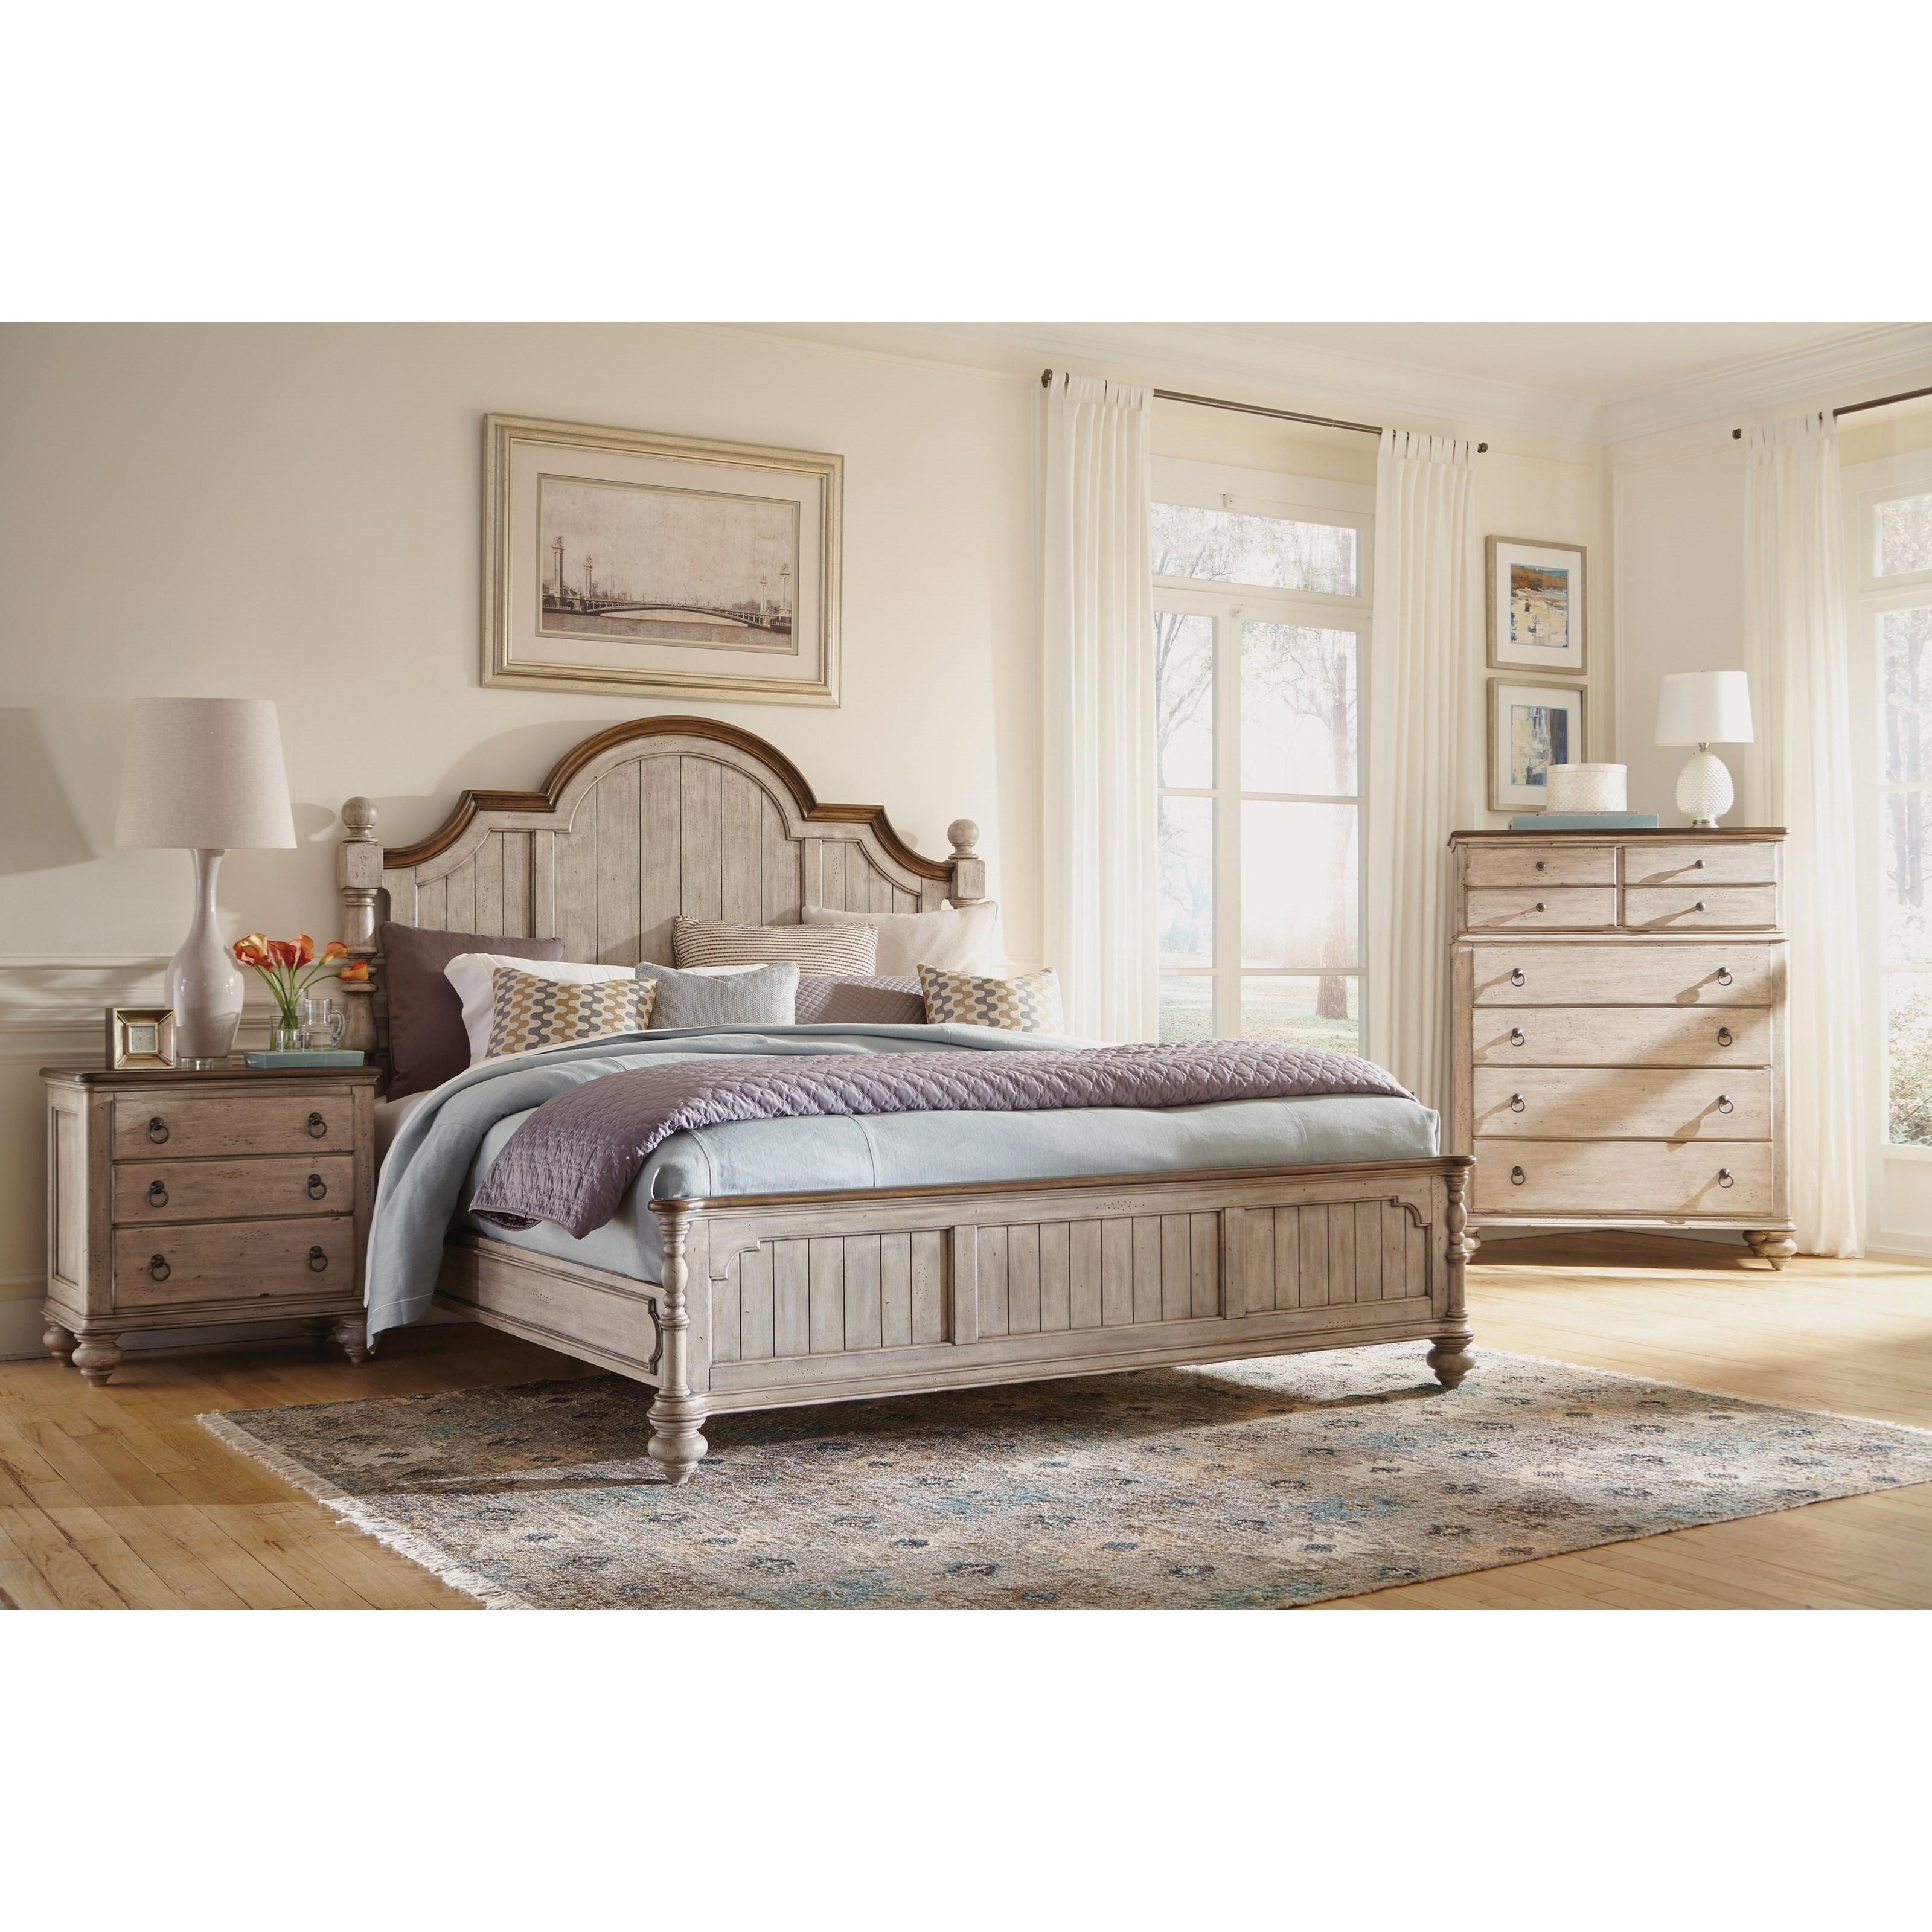 Flexsteel wynwood collection plymouth queen bedroom group for Bedroom groups